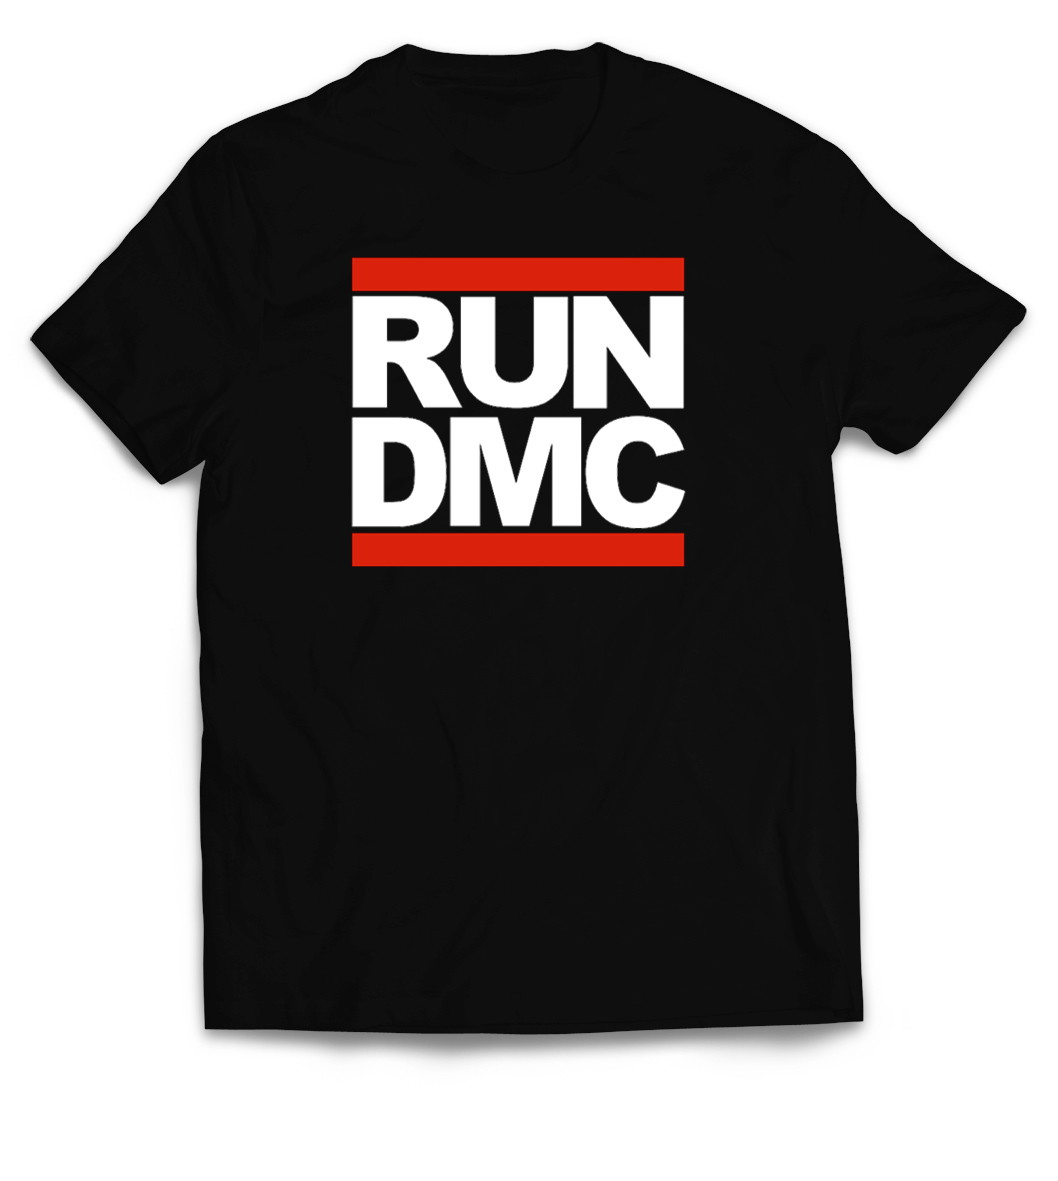 10f83b99b0e6d Camiseta Run DMC logo. camiseta de rap